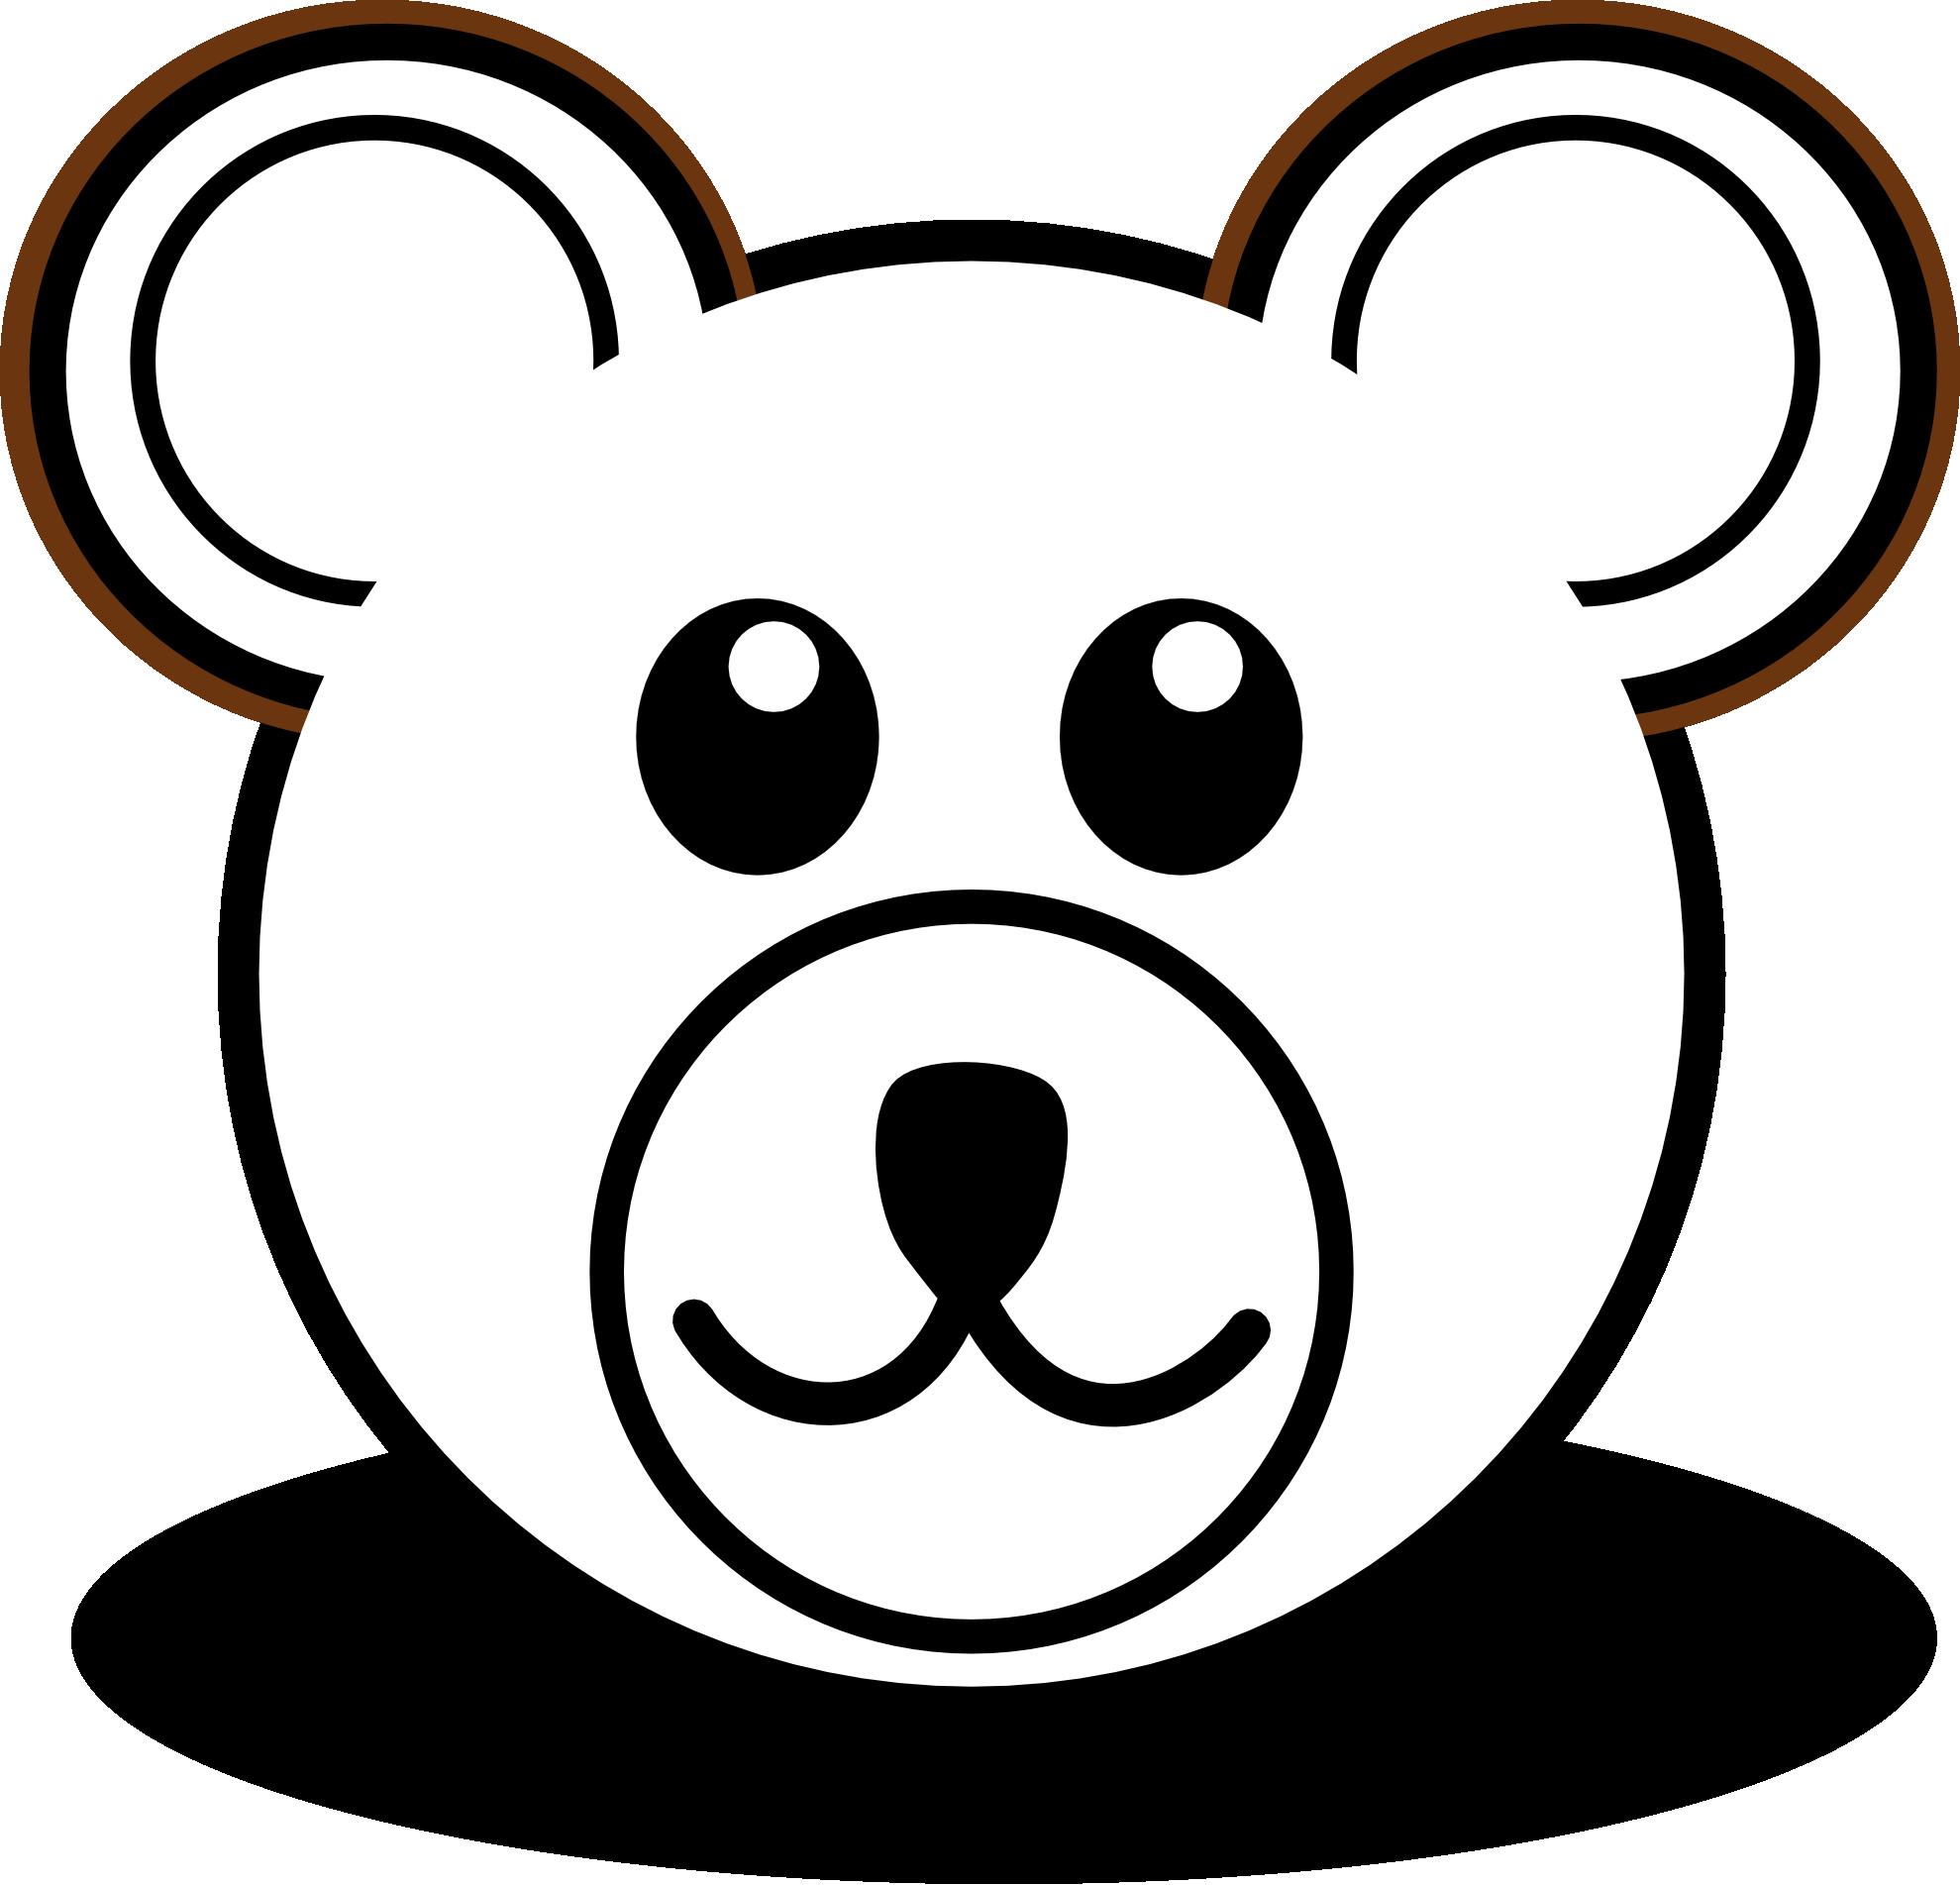 jpg black and white library Bear head cartoon brown. Adobe clipart black and white